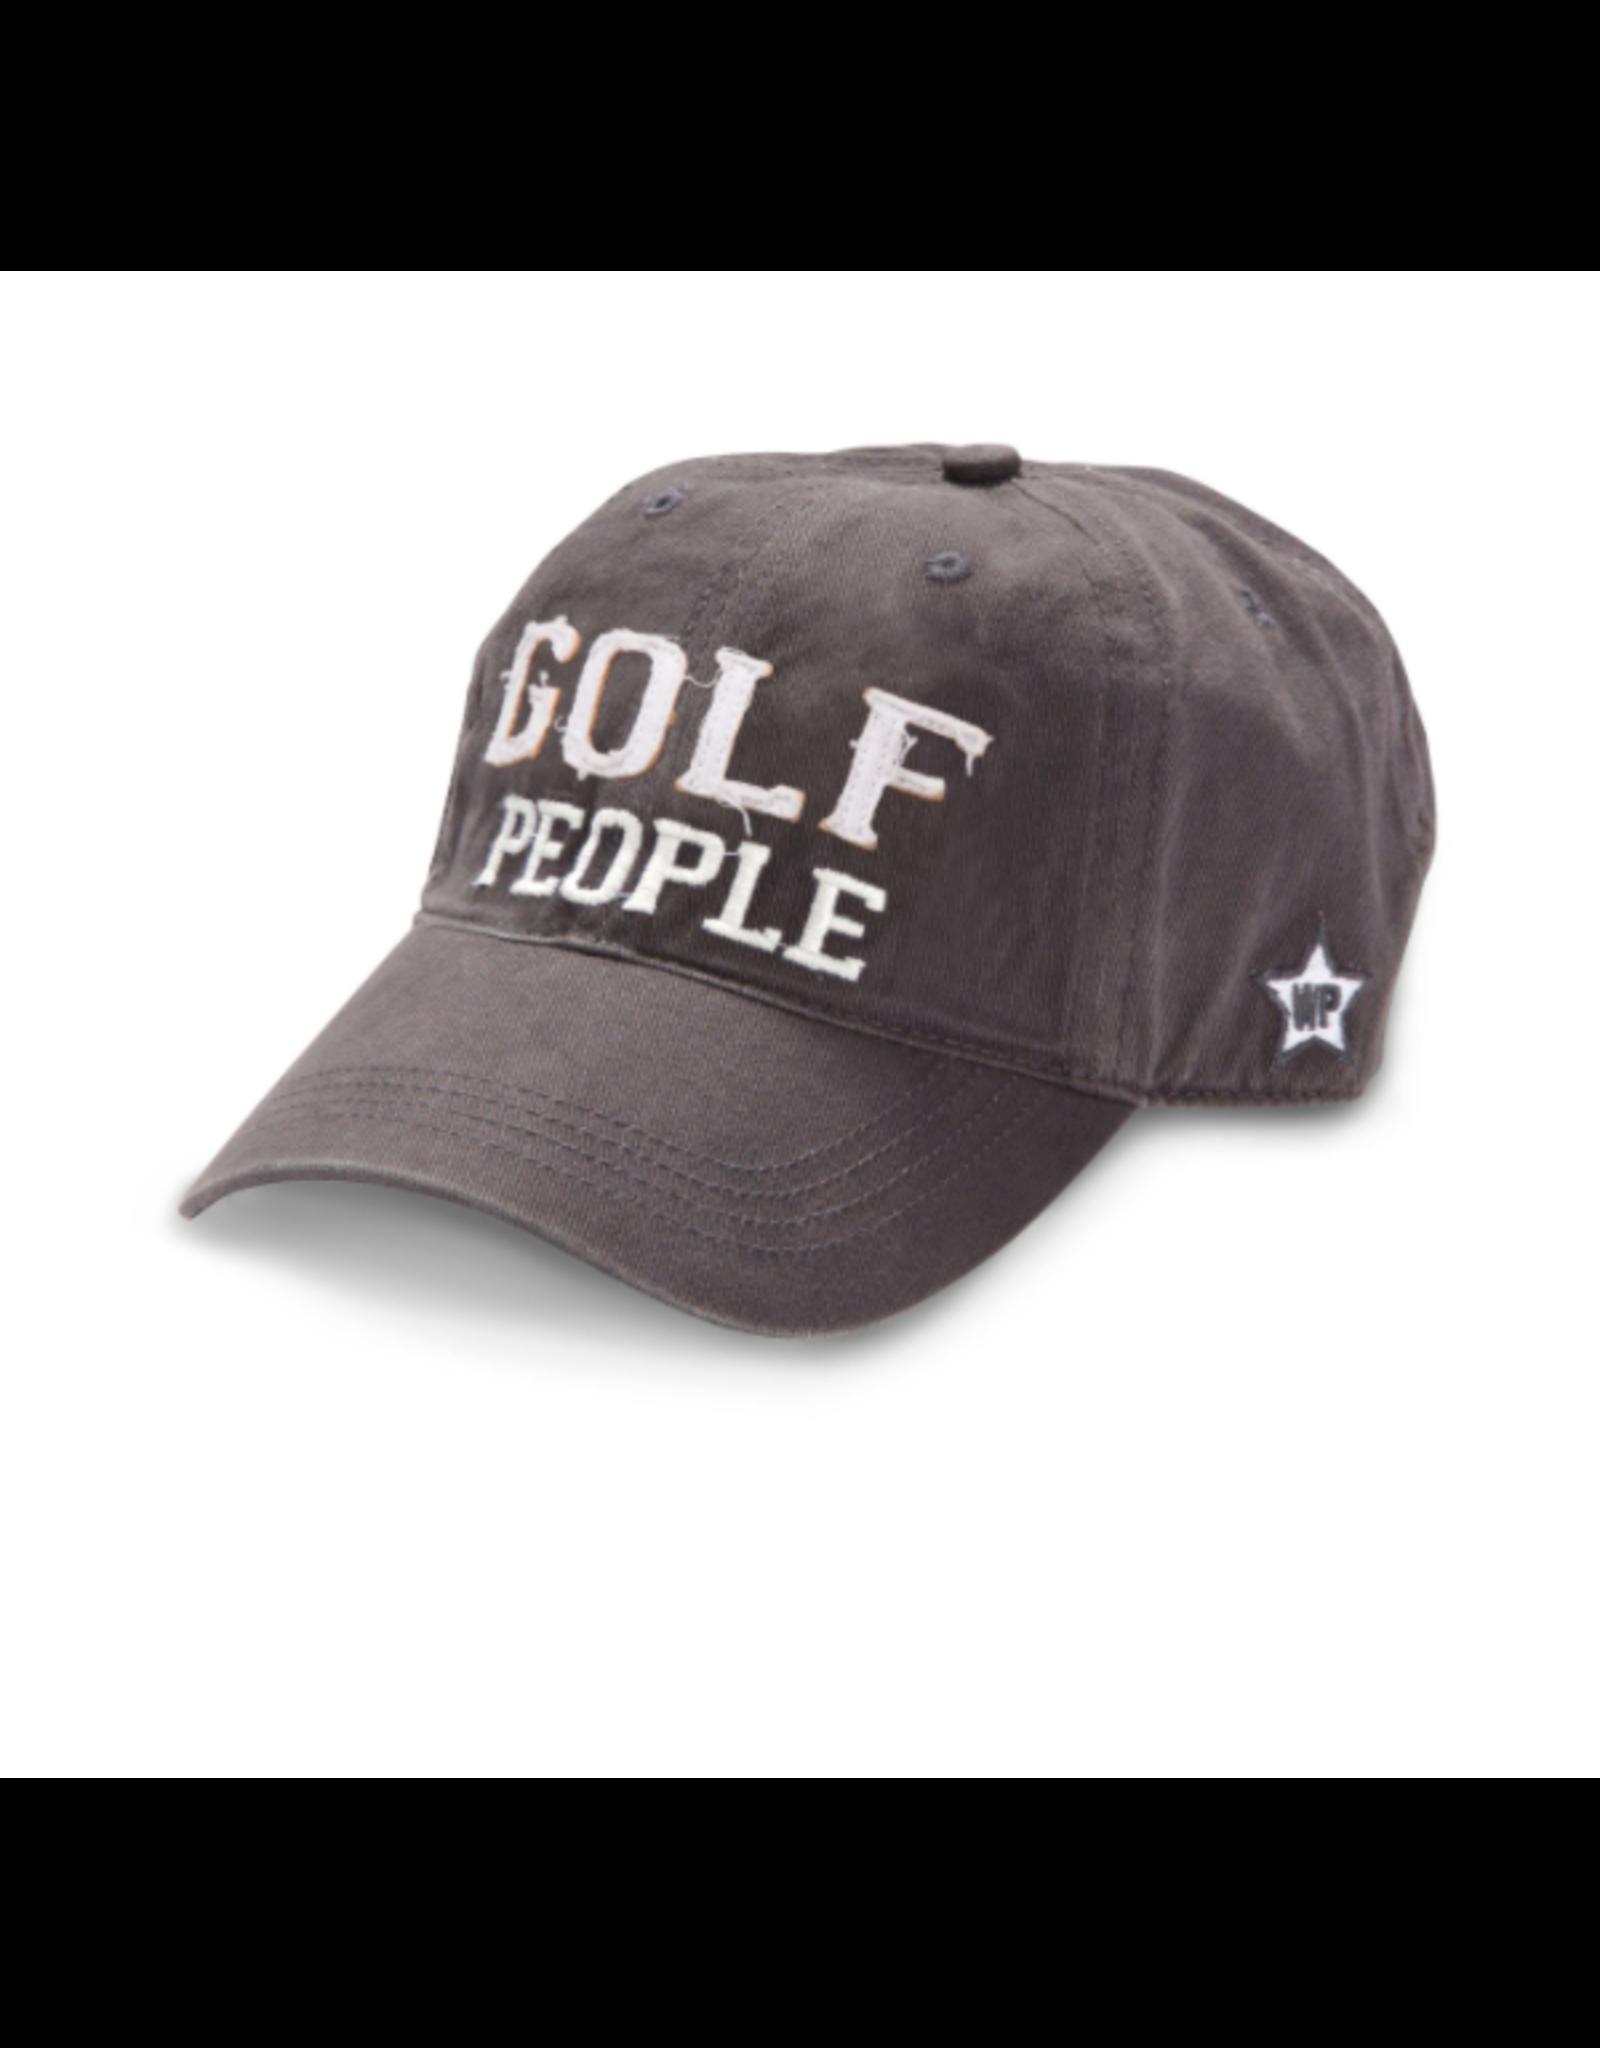 Golf People Ball Hat, grey